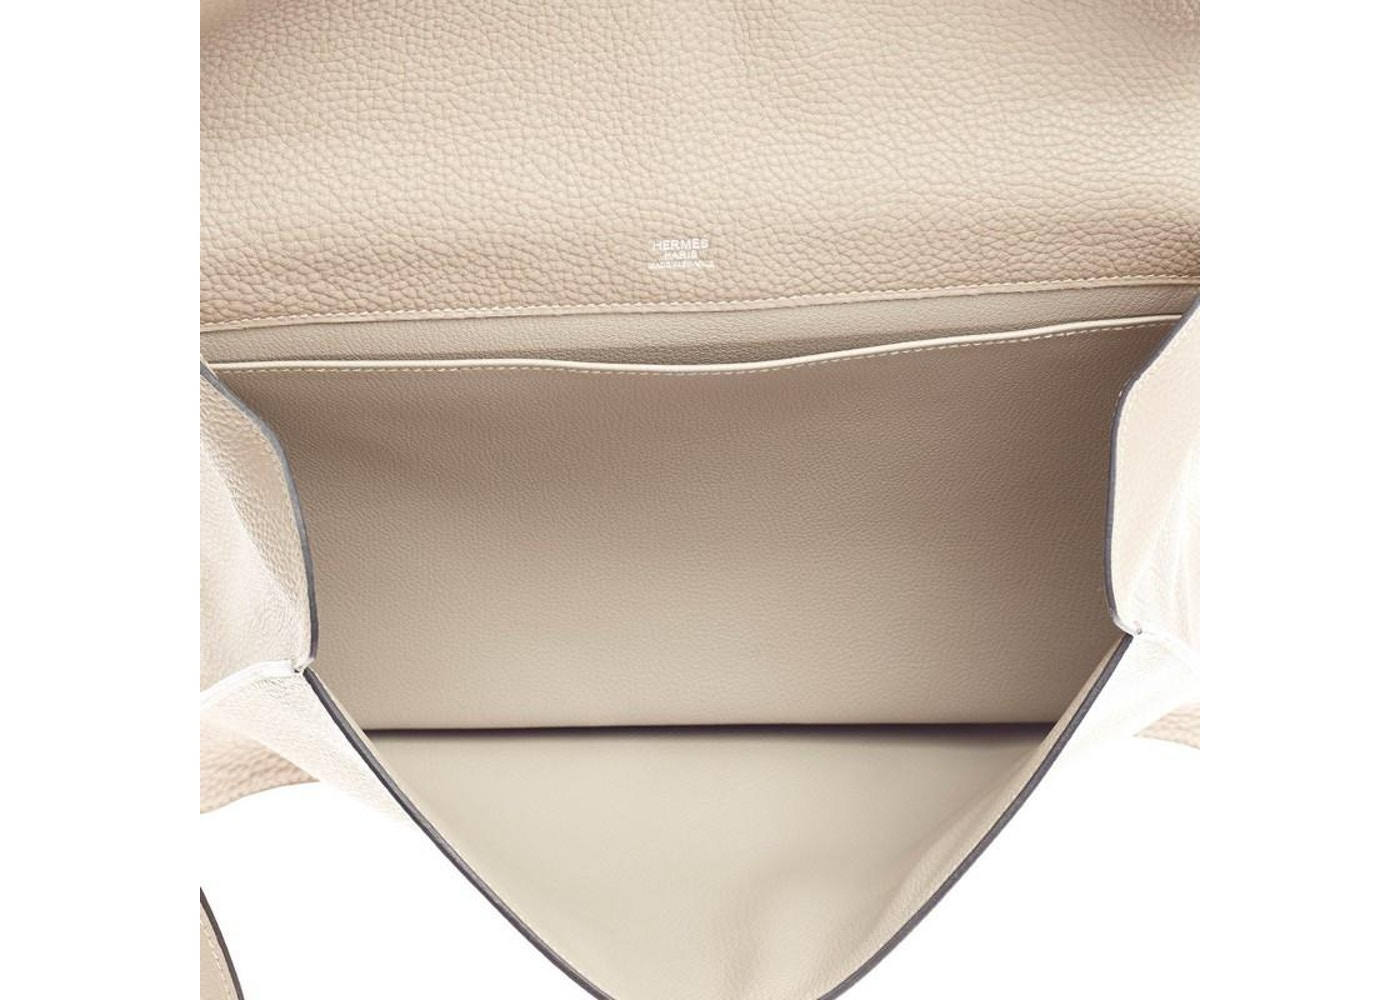 ebc9c785a2 Hermes Handbag Etribelt Togo Gris Tourterelle